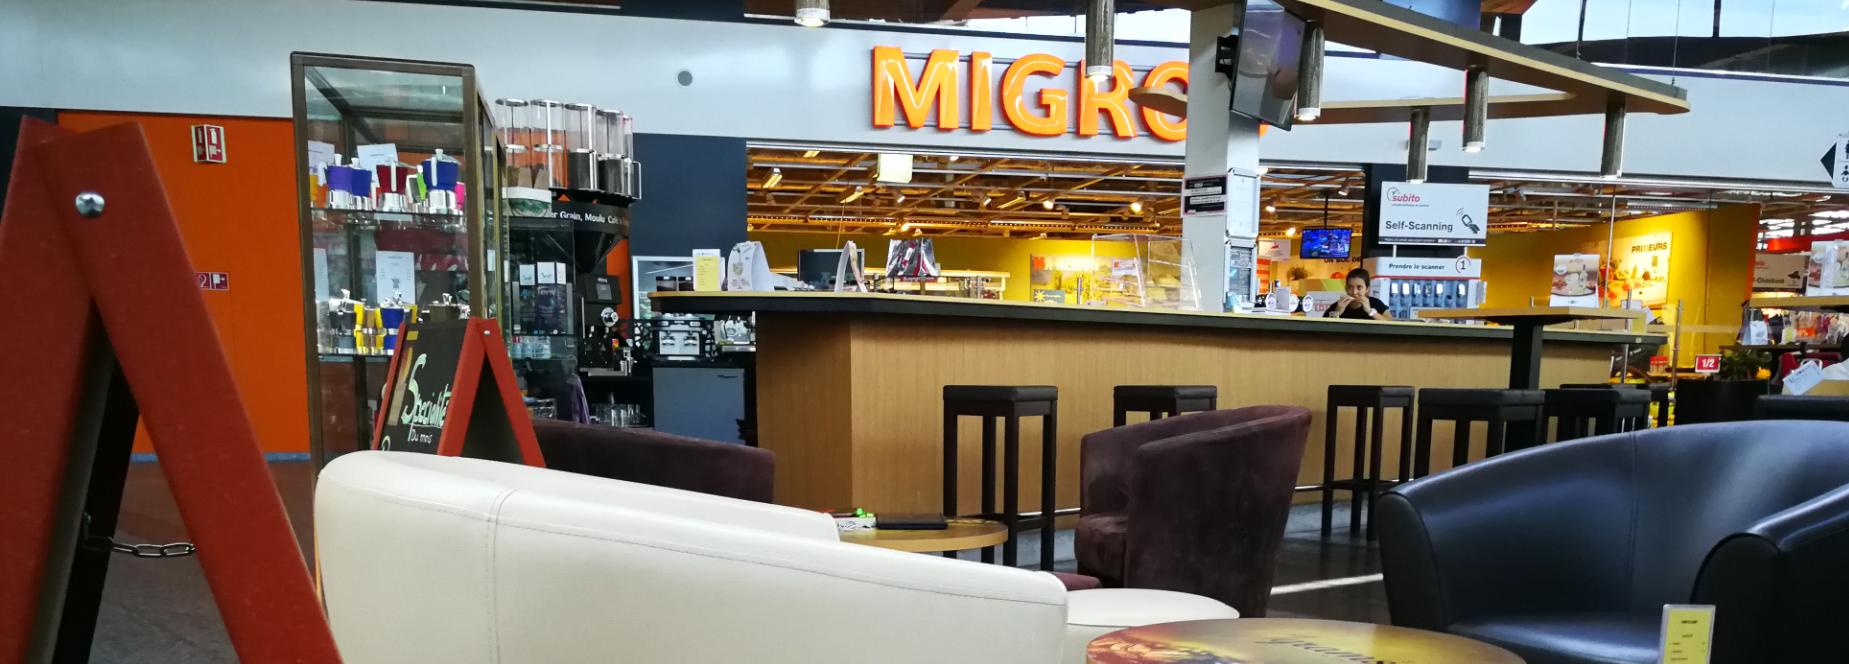 mkd-ls-gallery-img